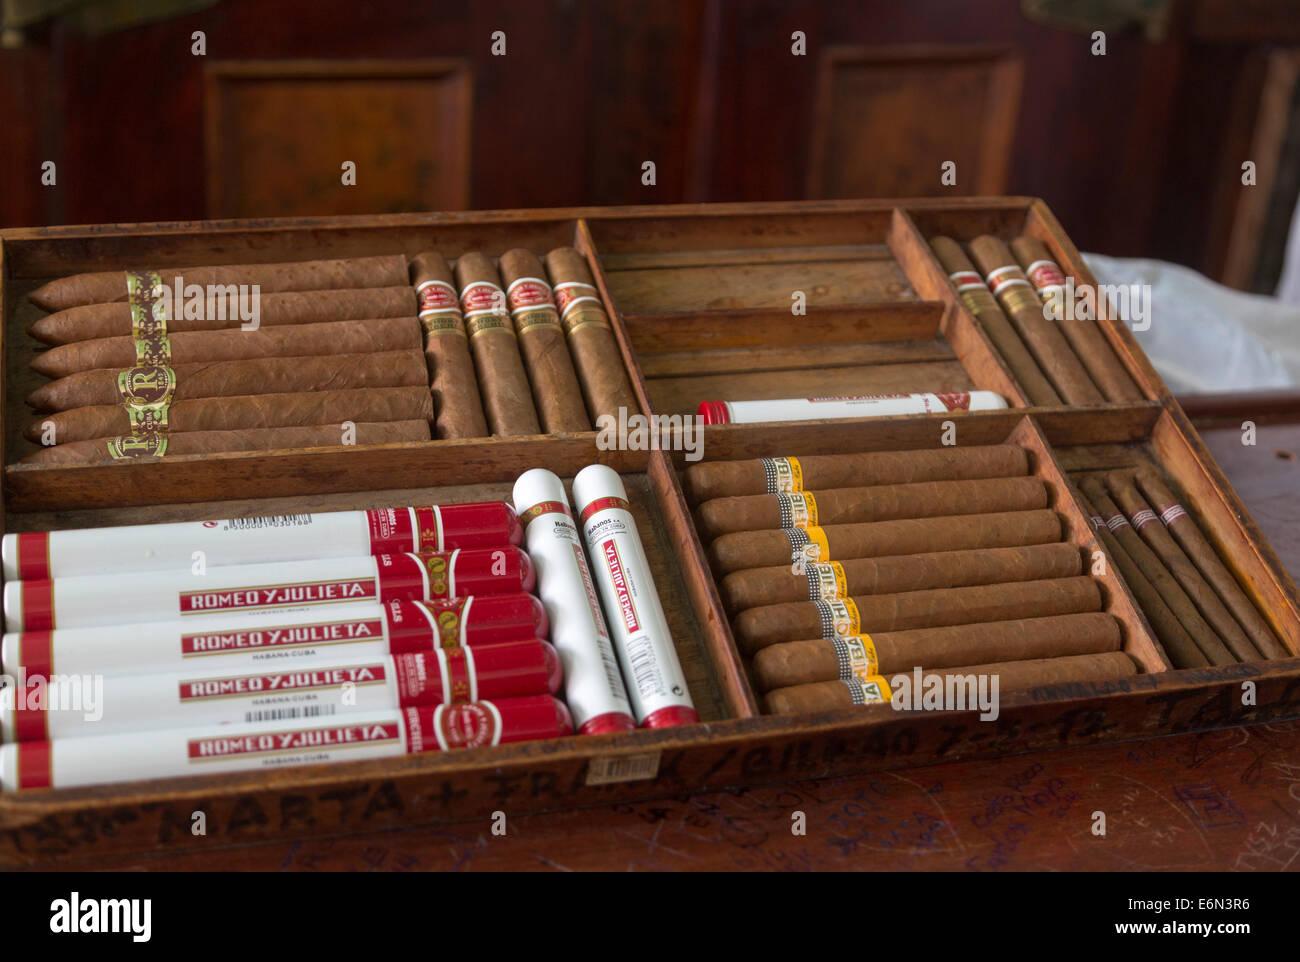 Stapel von Zigarren zu verkaufen, La Bodeguita del Medio Bar, Havanna, Kuba Stockbild